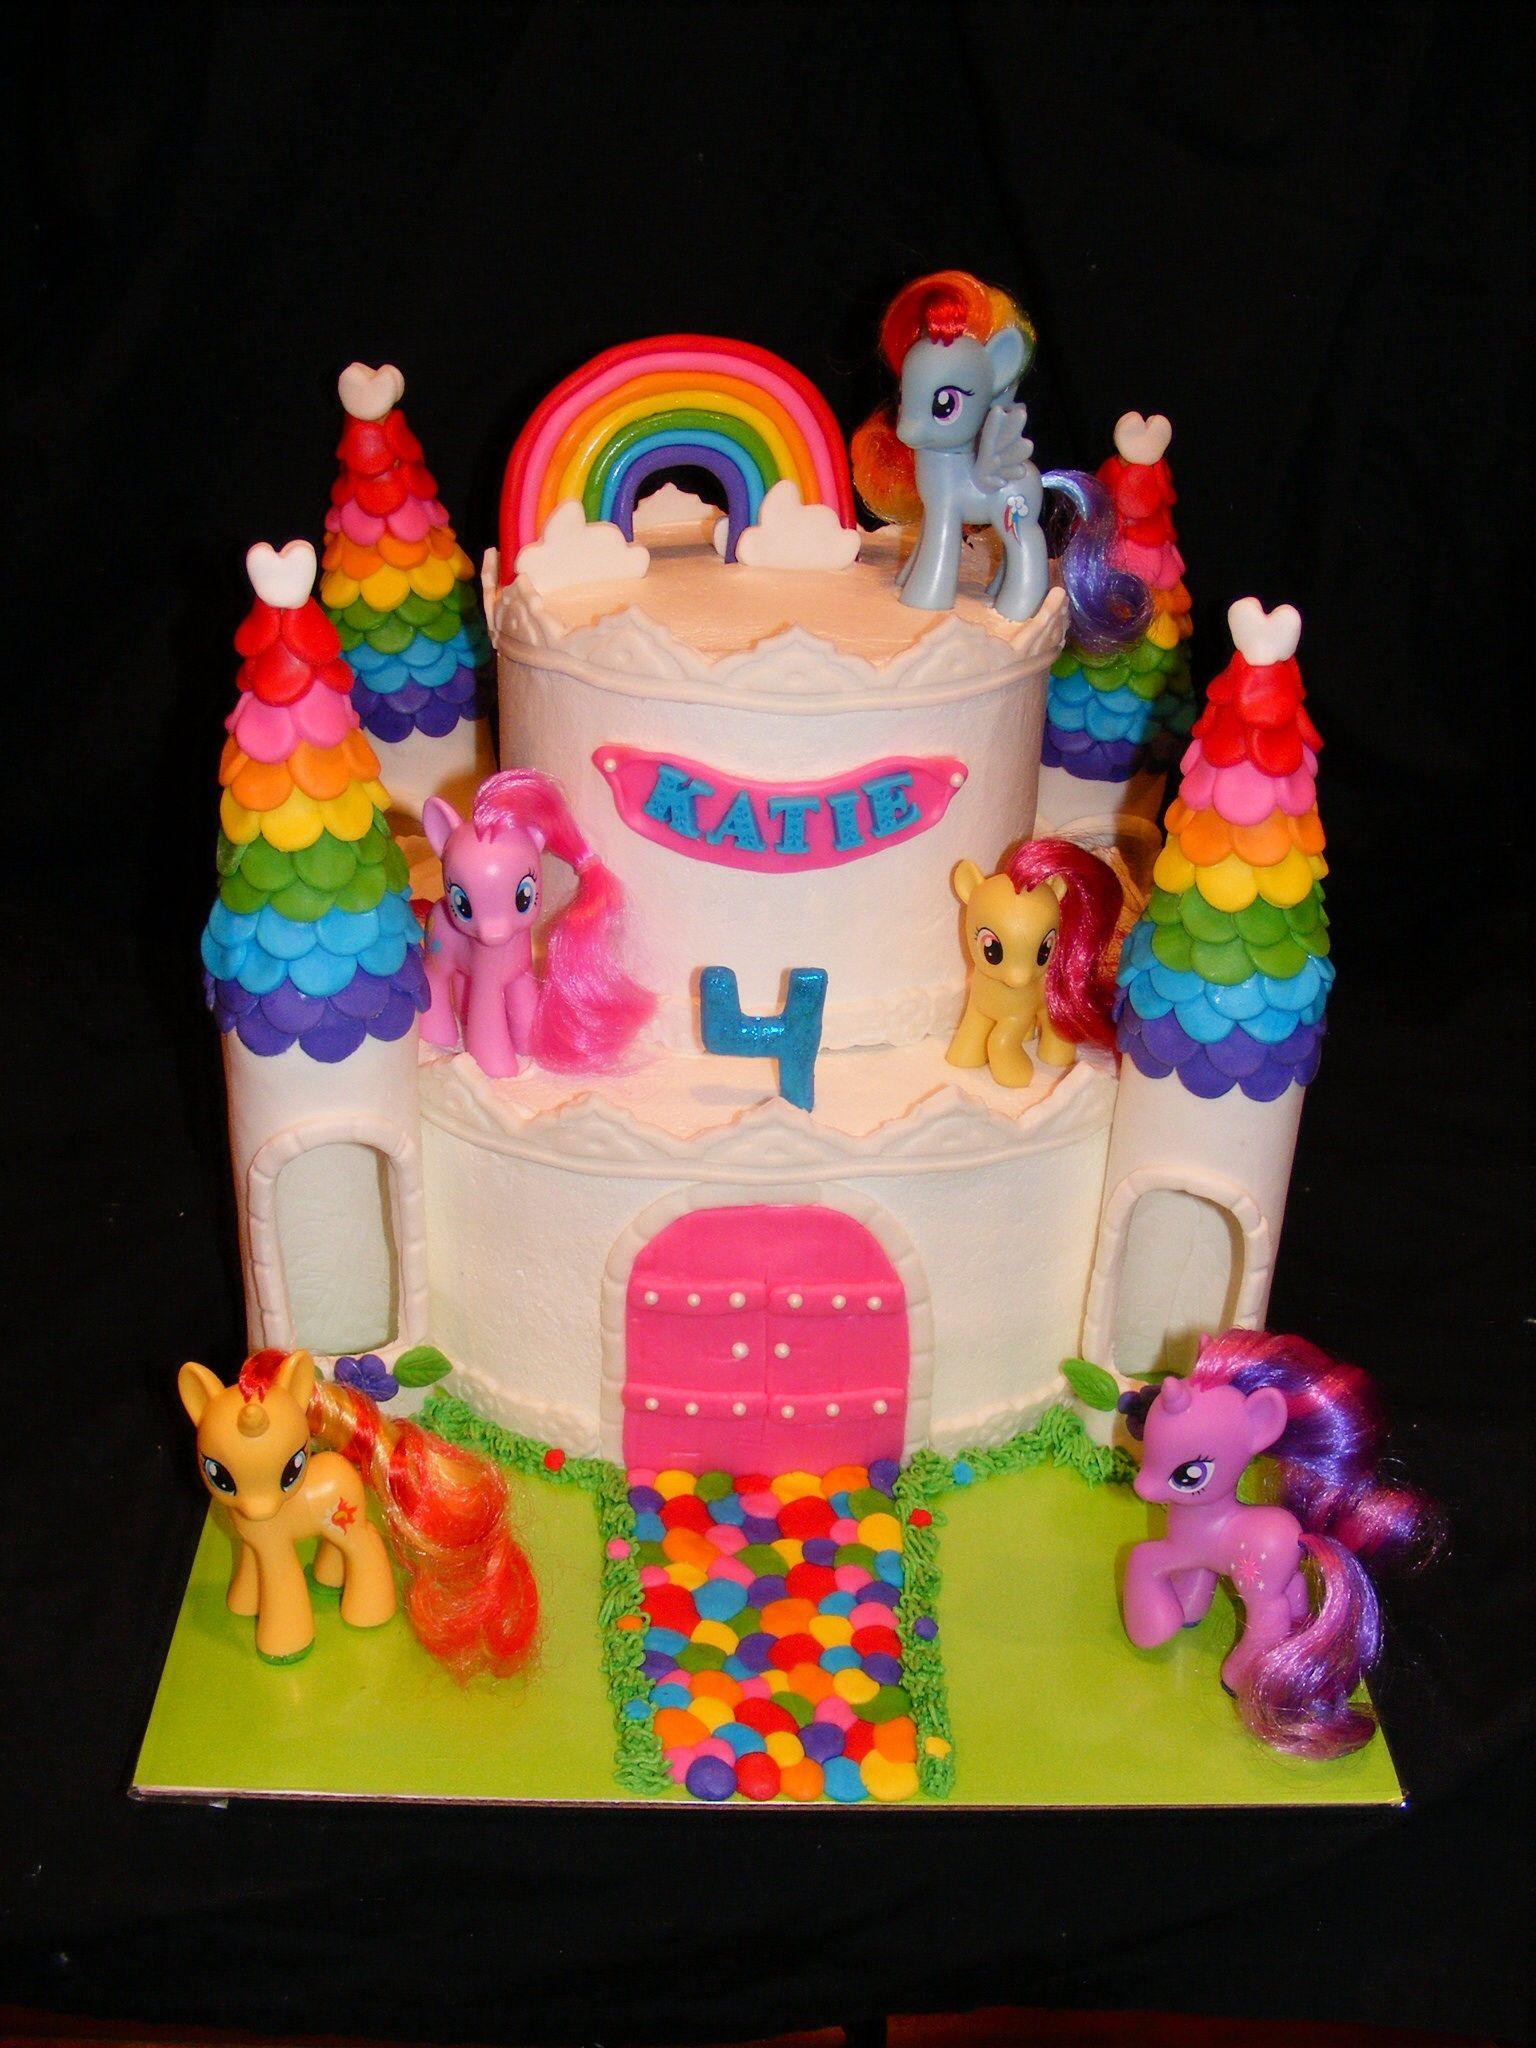 My little pony castle cake cake my little pony cake birthday party